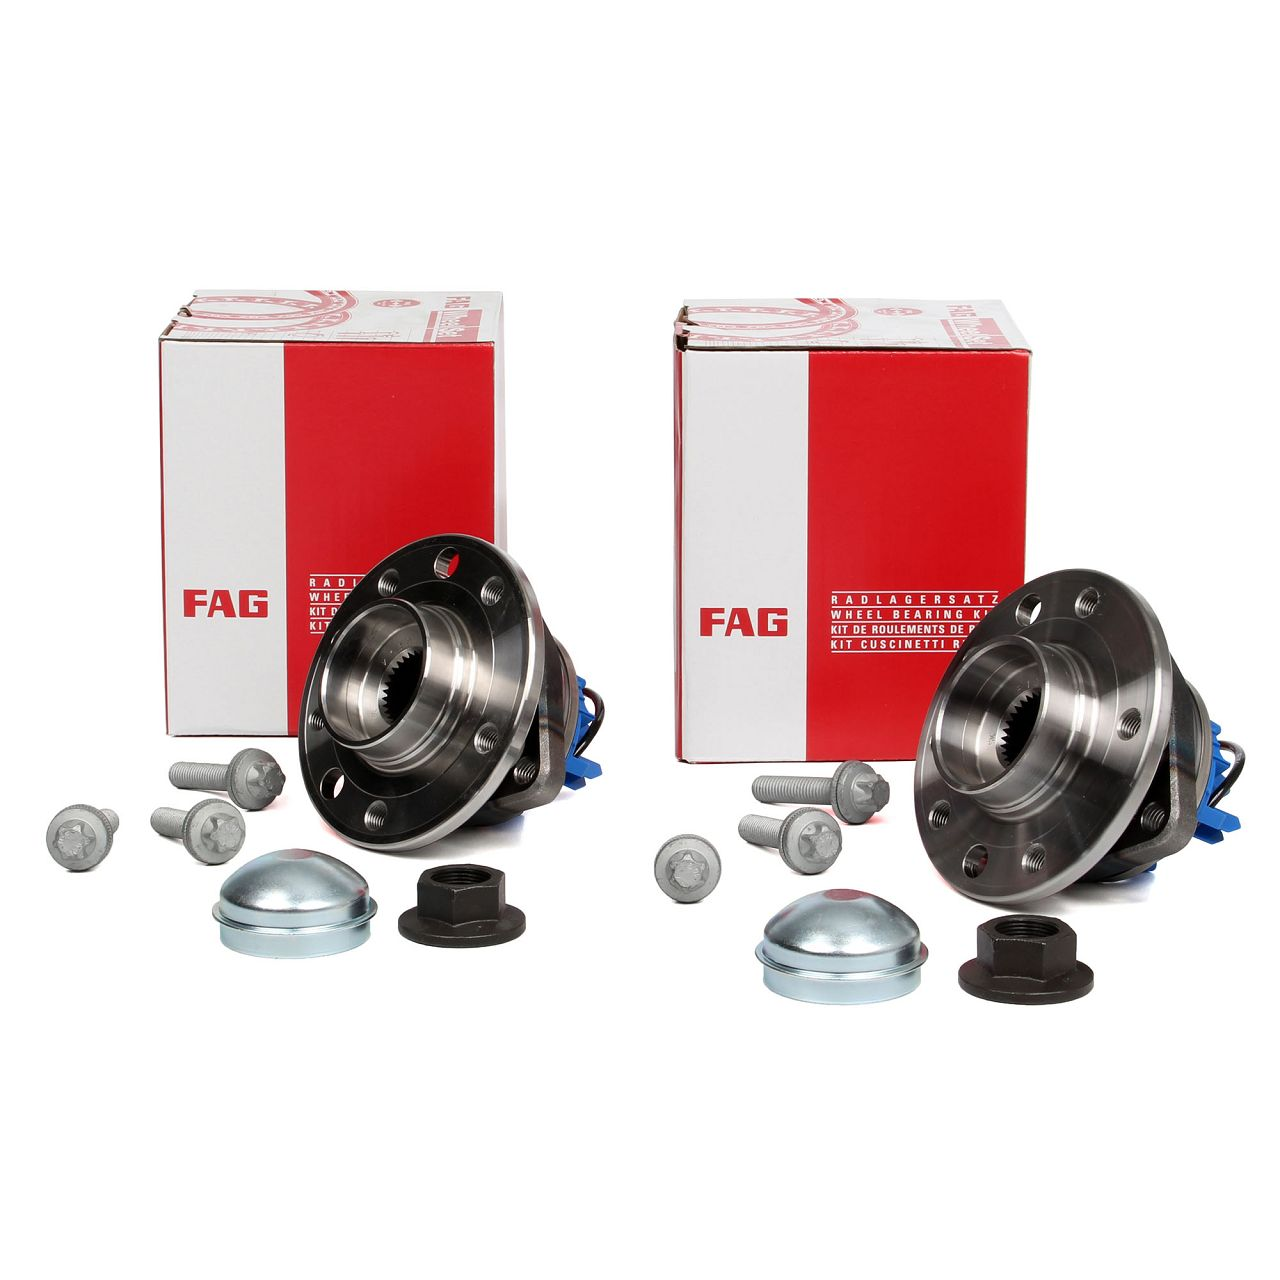 2x FAG 713644270 Radnabe Radlager + ABS Sensor 5-Loch OPEL Signum Vectra C vorne